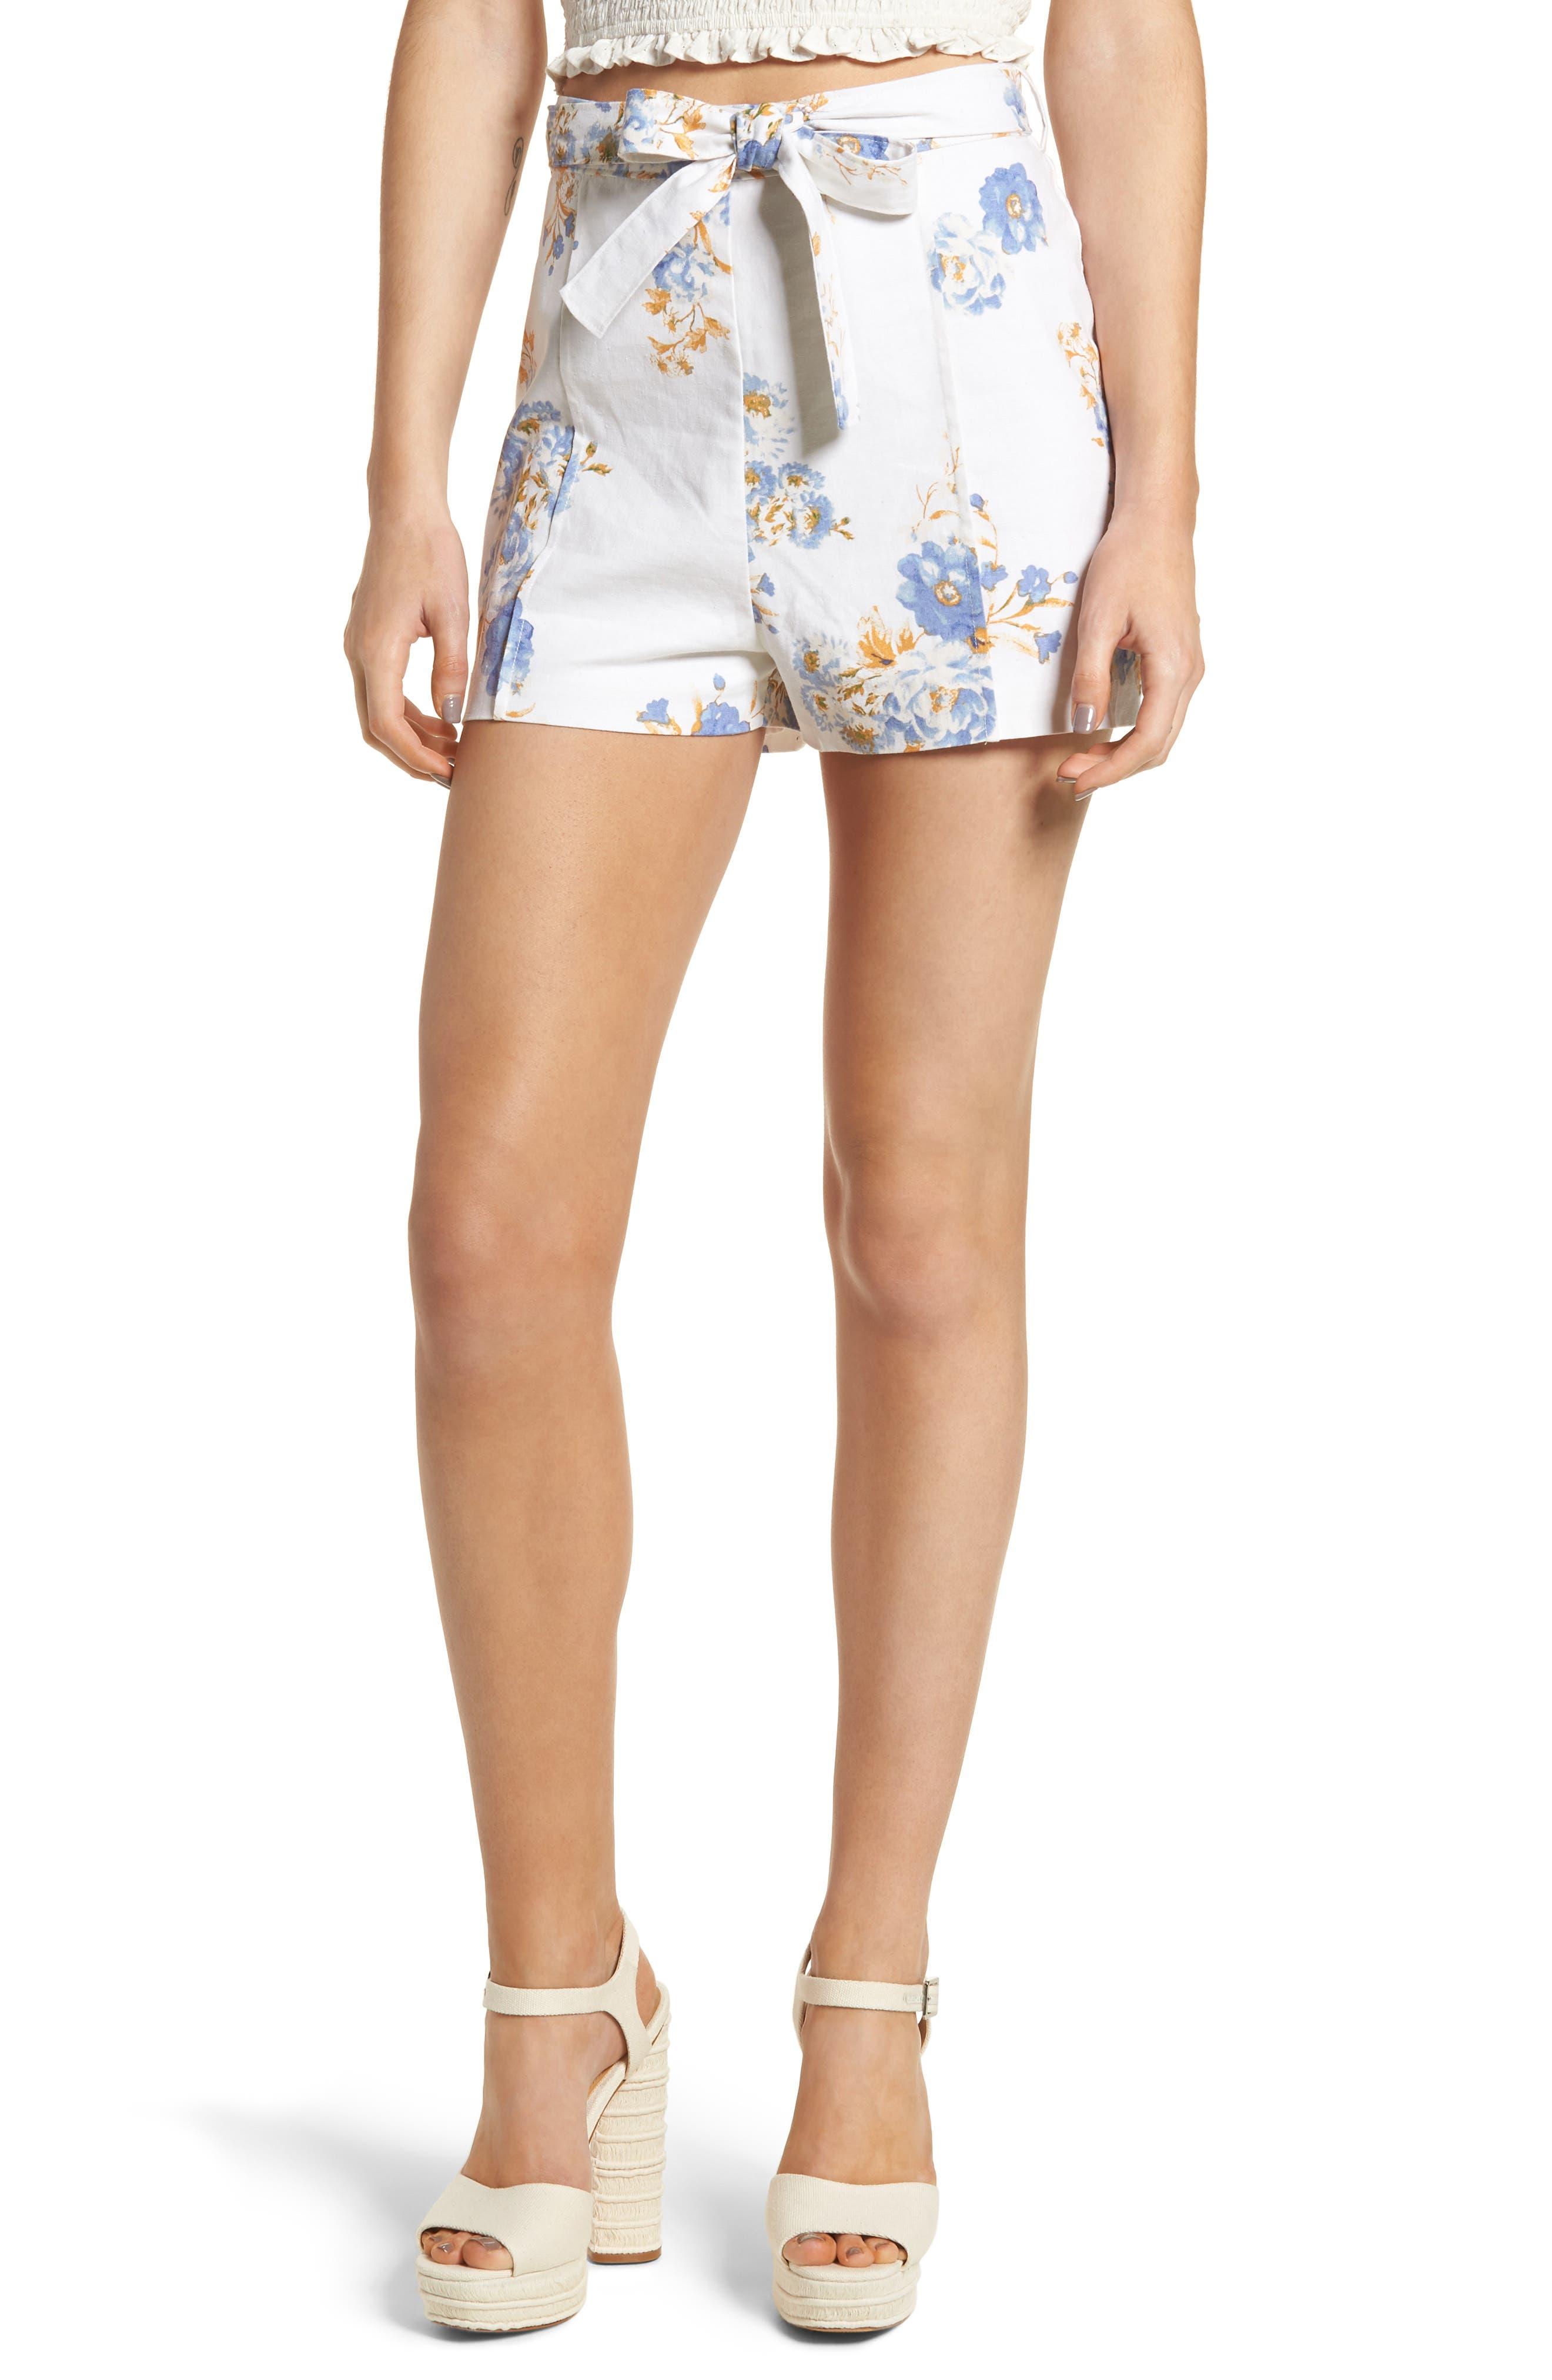 Matera High Waist Shorts,                         Main,                         color, Ivory Floral